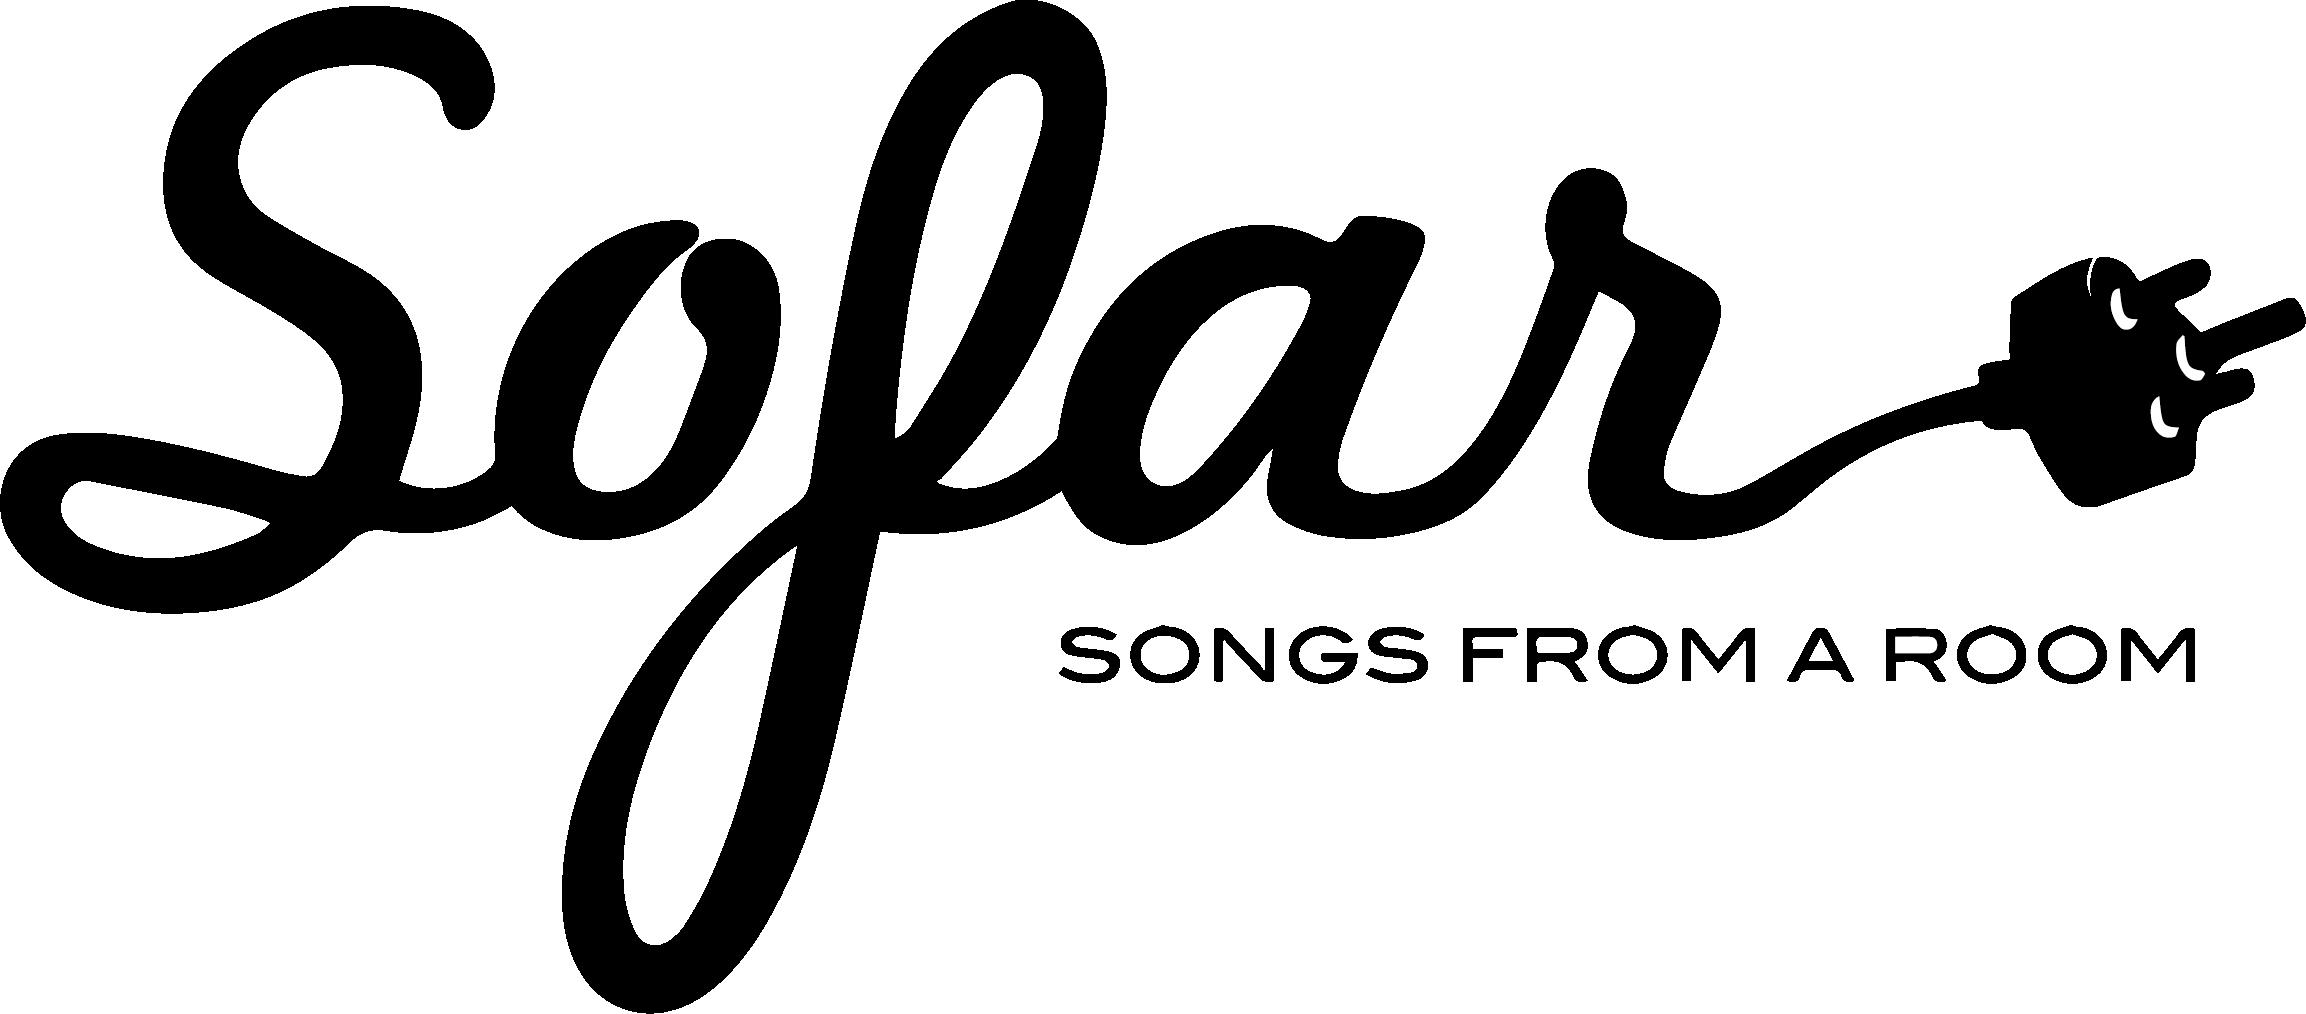 Sofar Sounds logo.png